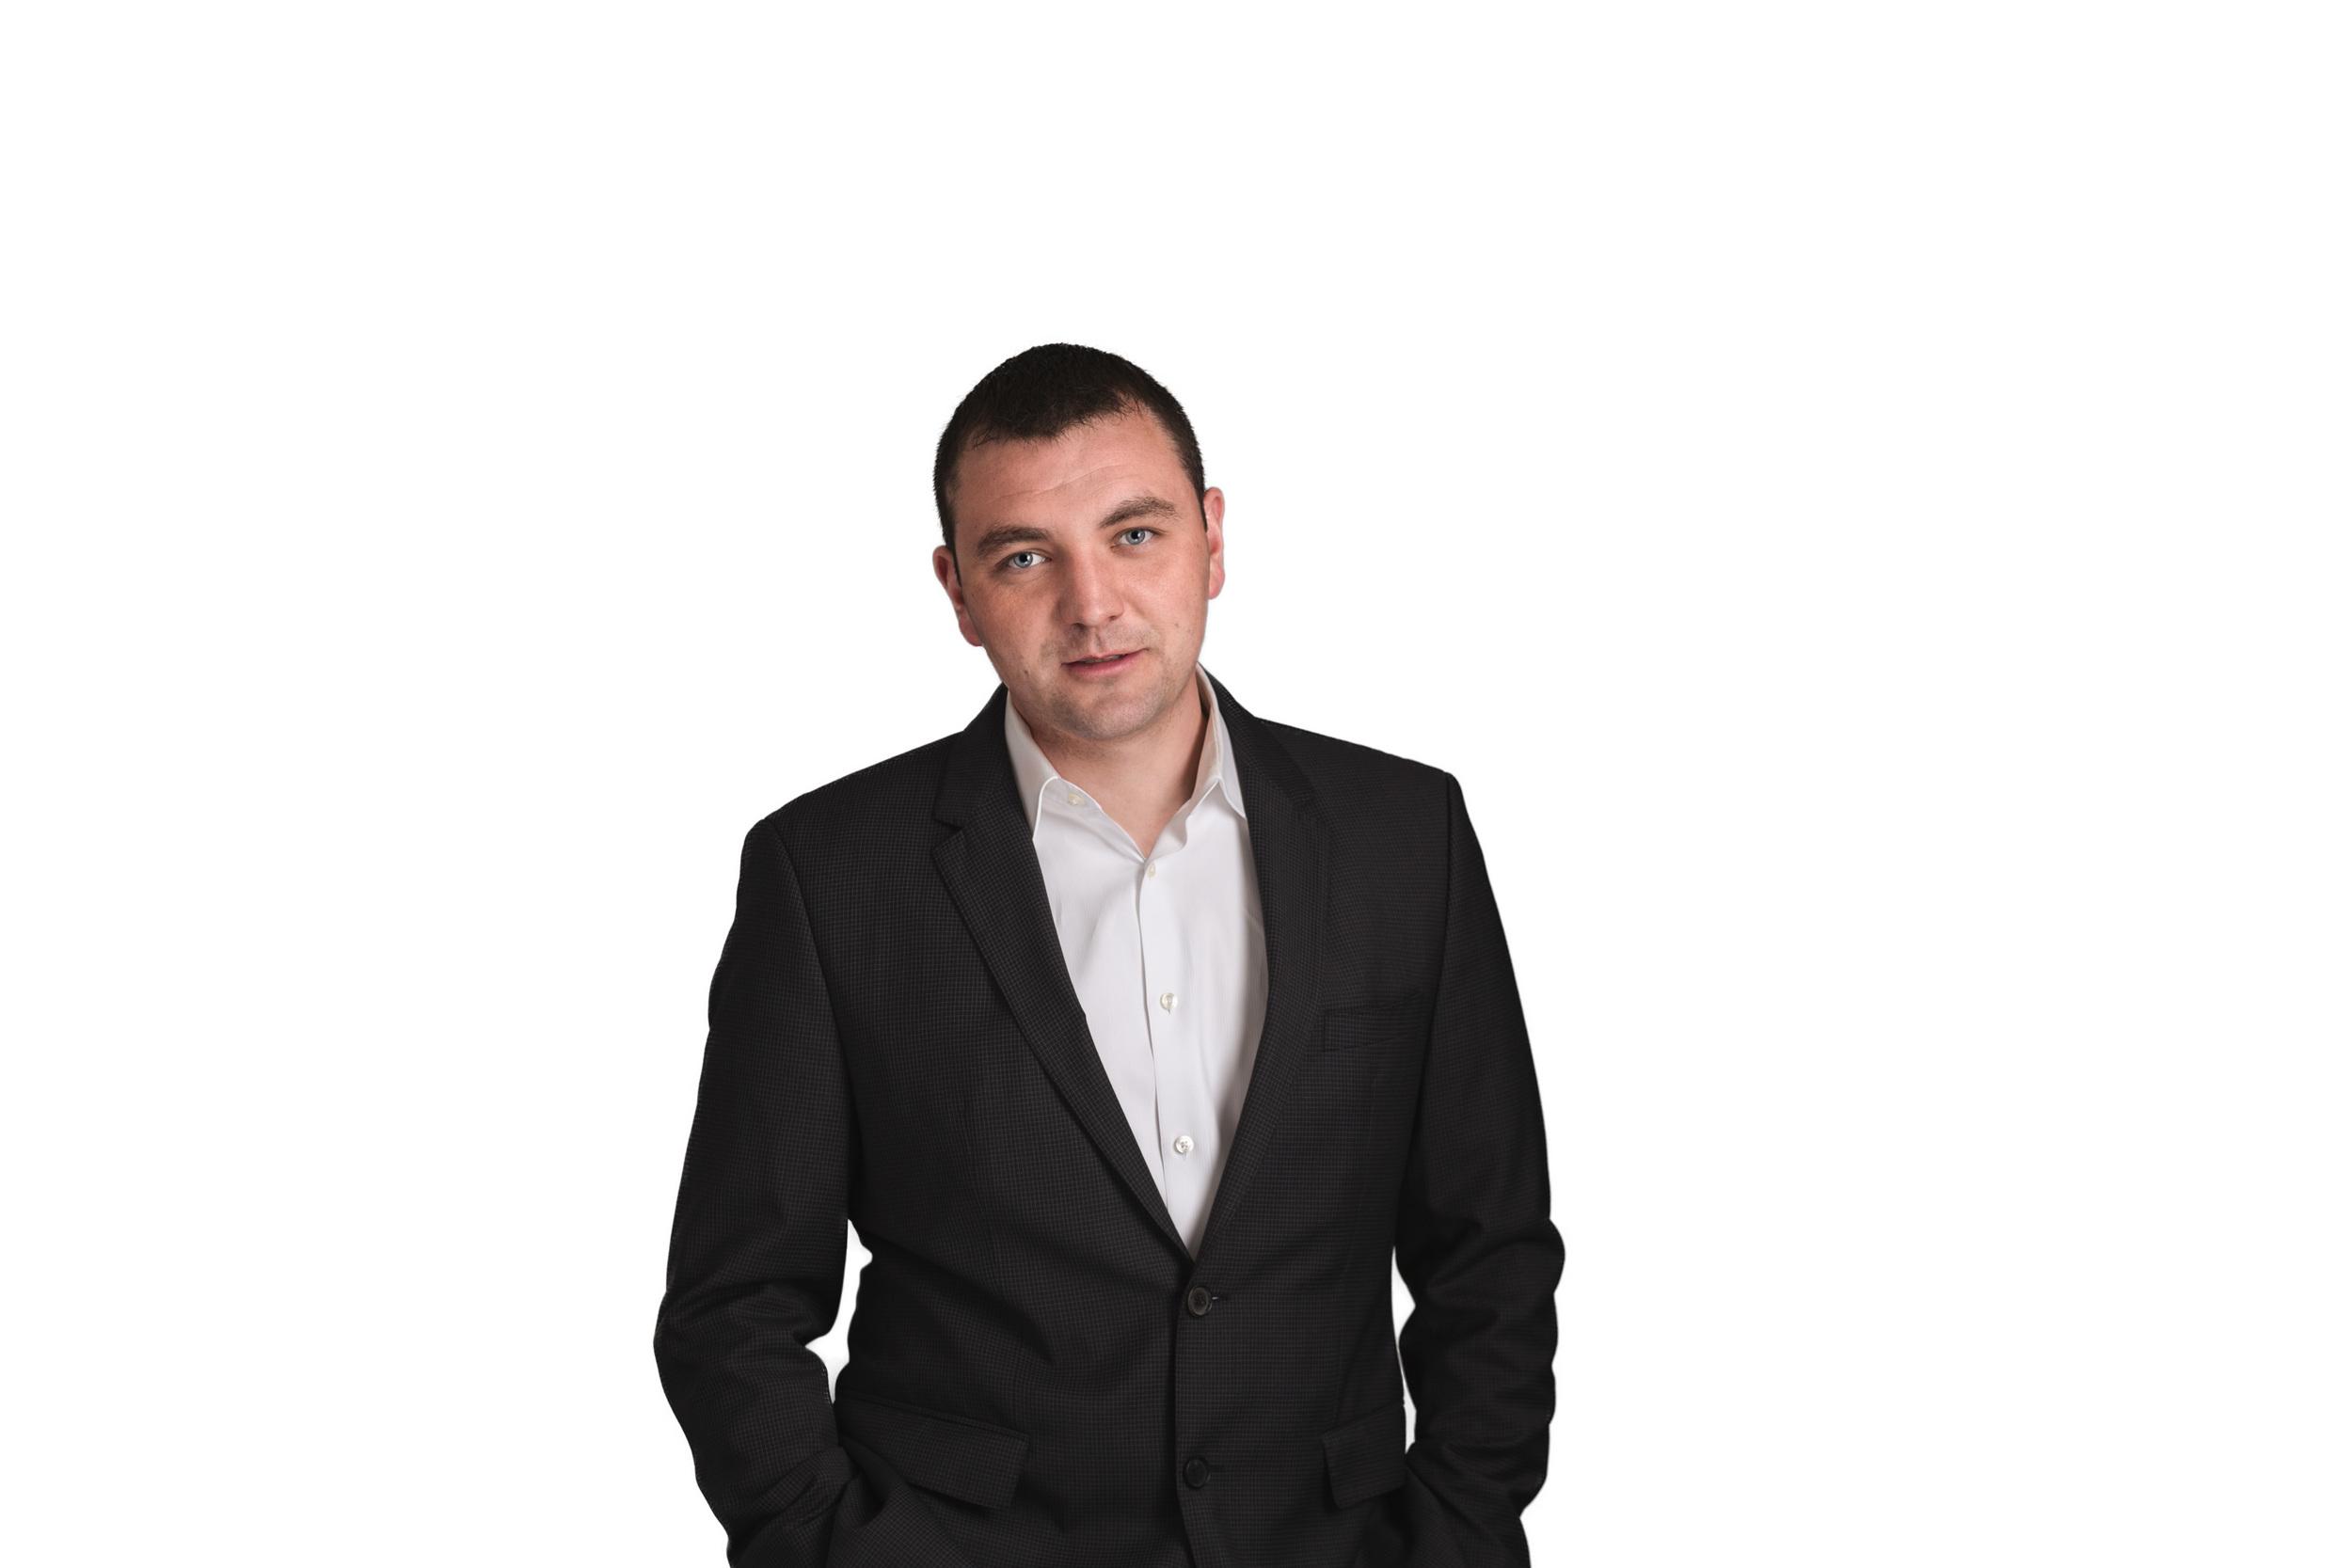 Alek Keytiyev - Top Producing Realtor in the San Francisco Bay Area